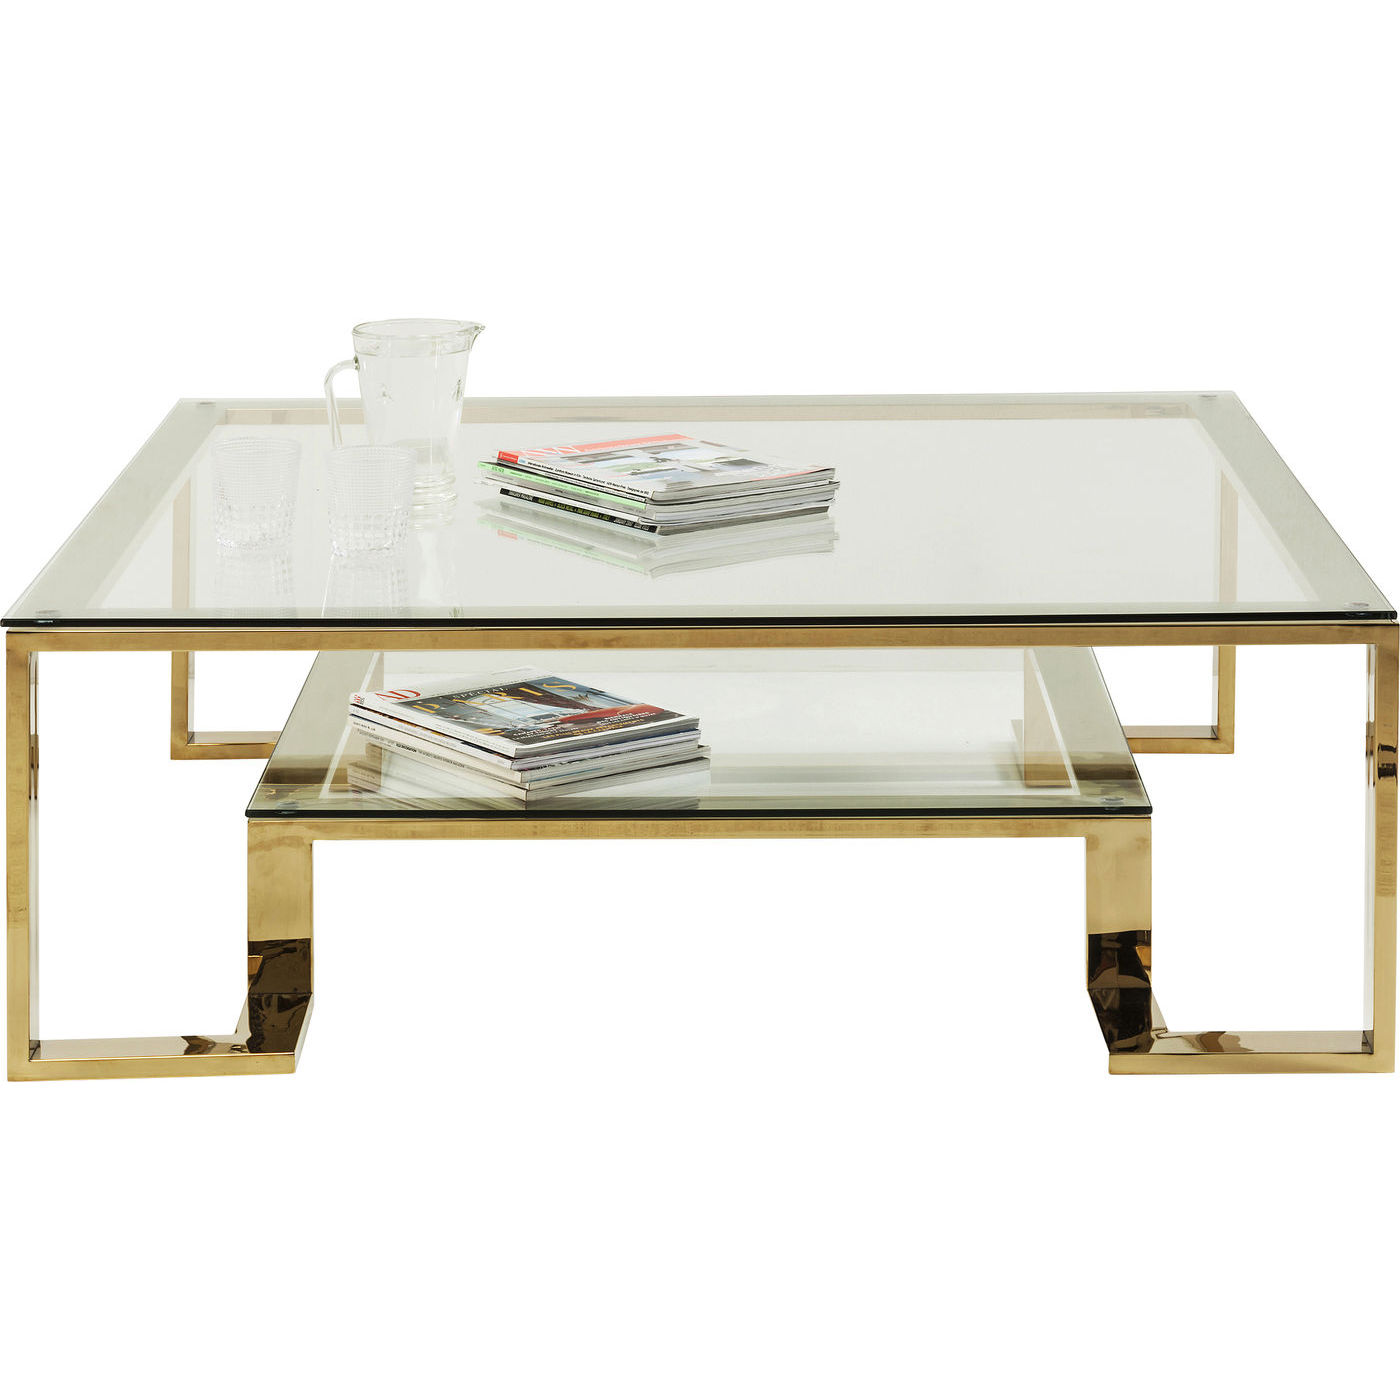 KARE DESIGN Gold Rush sofabord - glasplade og guld stål (120x120)